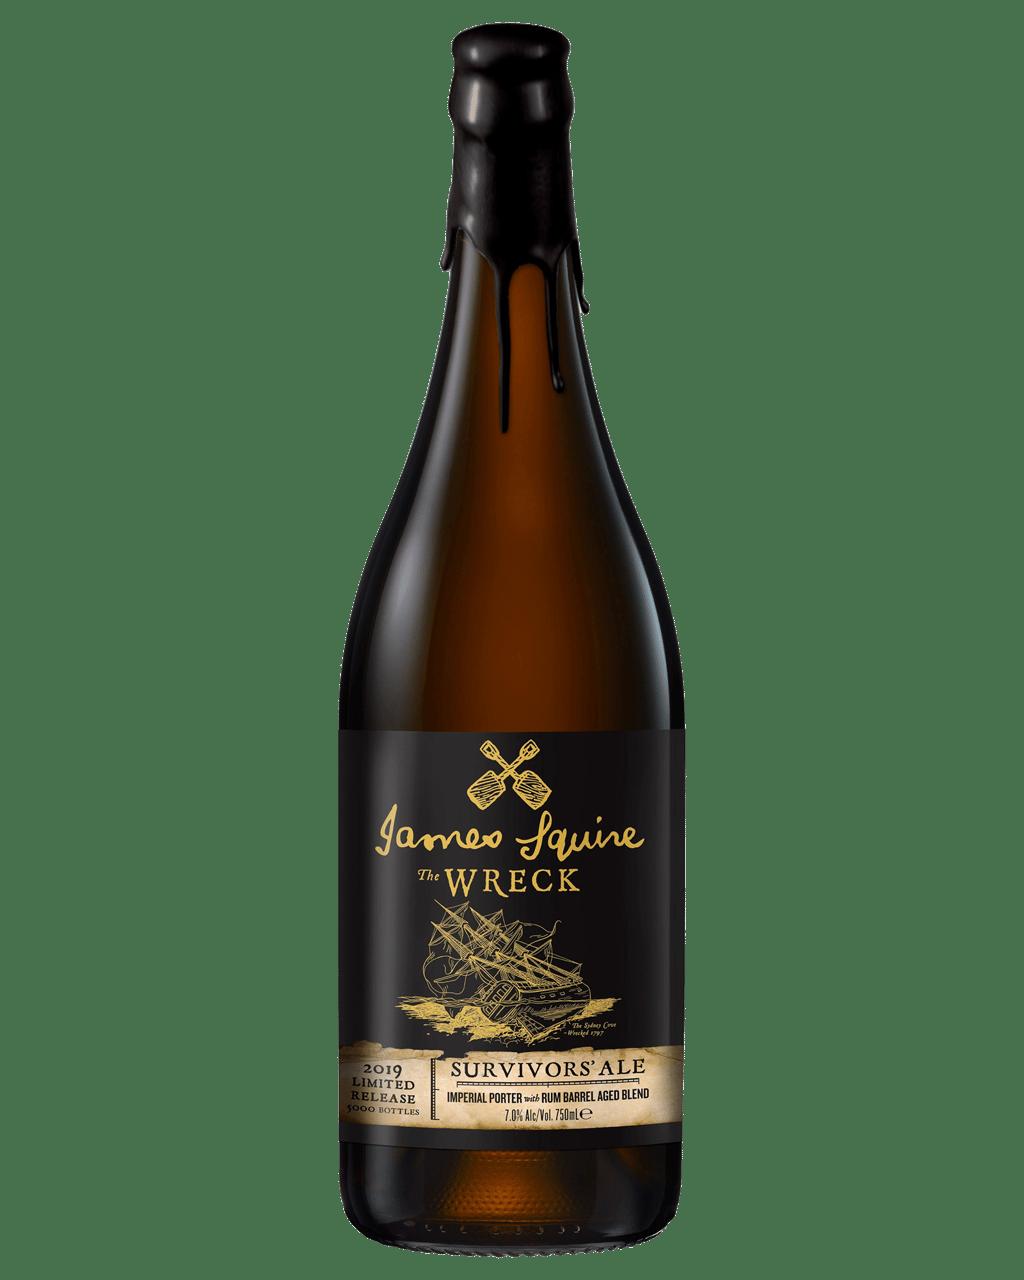 Buy James Squire The Wreck Survivors Ale 750mL | Dan Murphy's